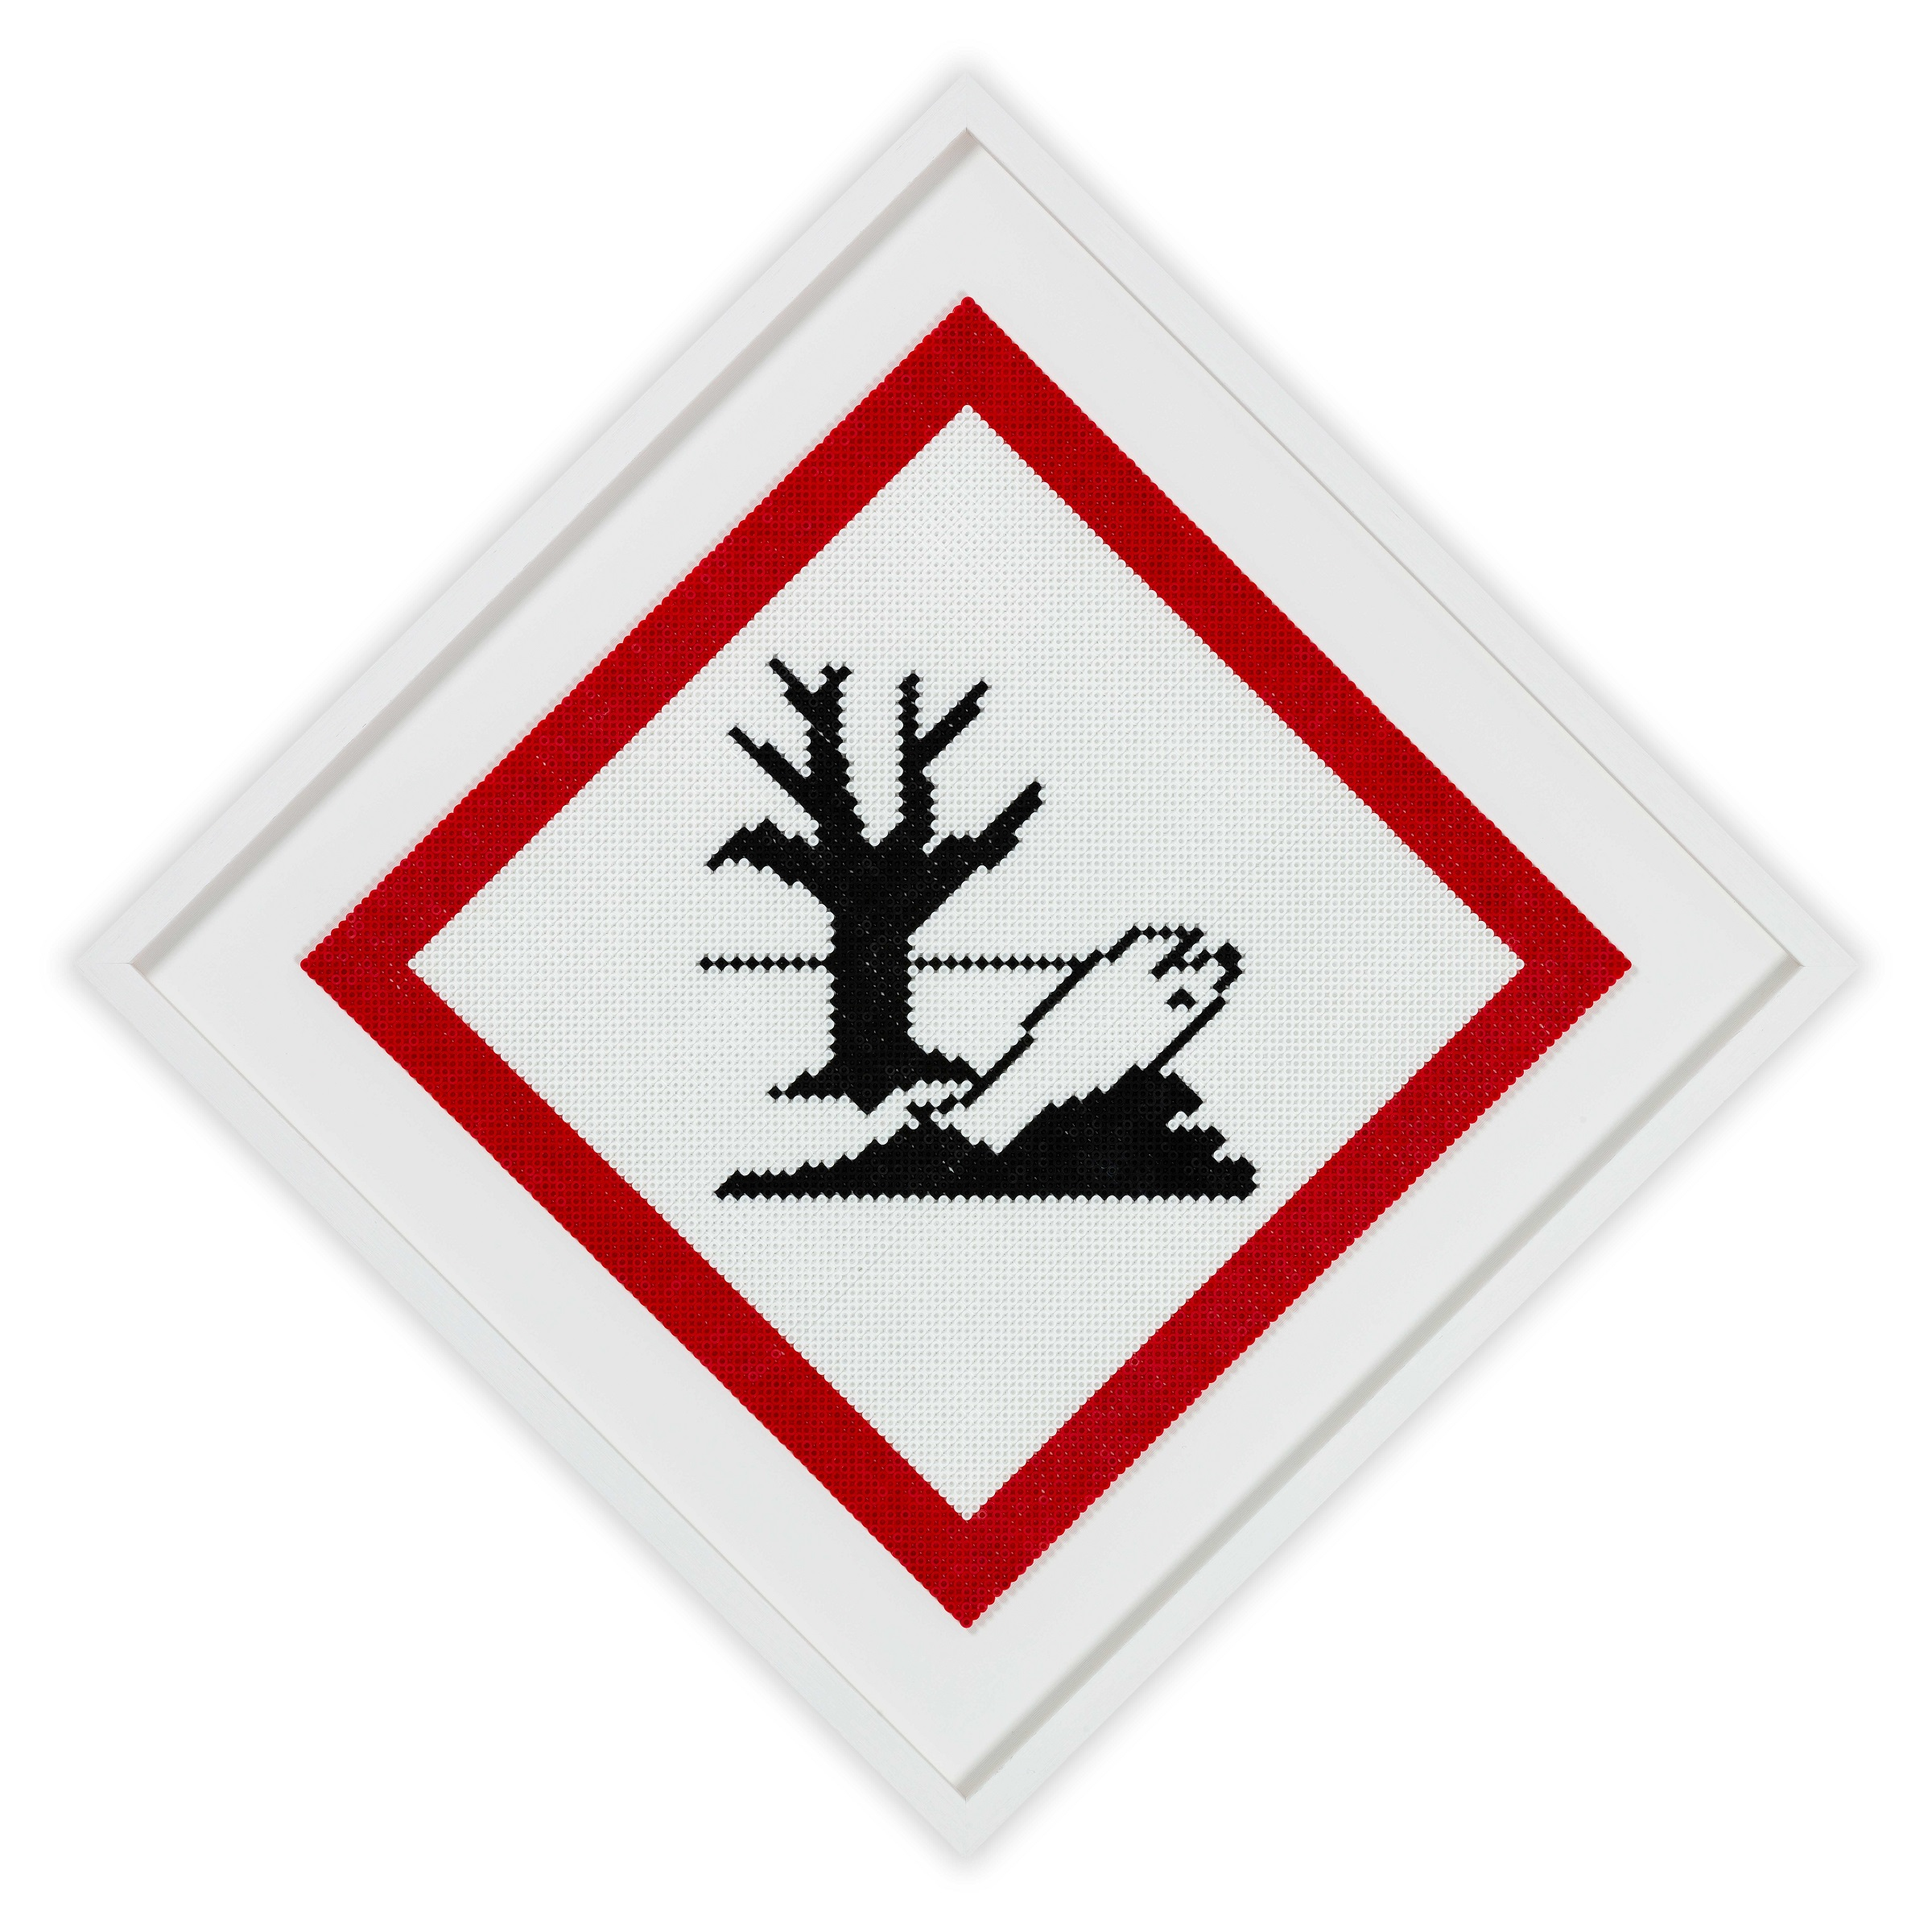 PLASTIC WARNING SIGN 2/4 – 2020